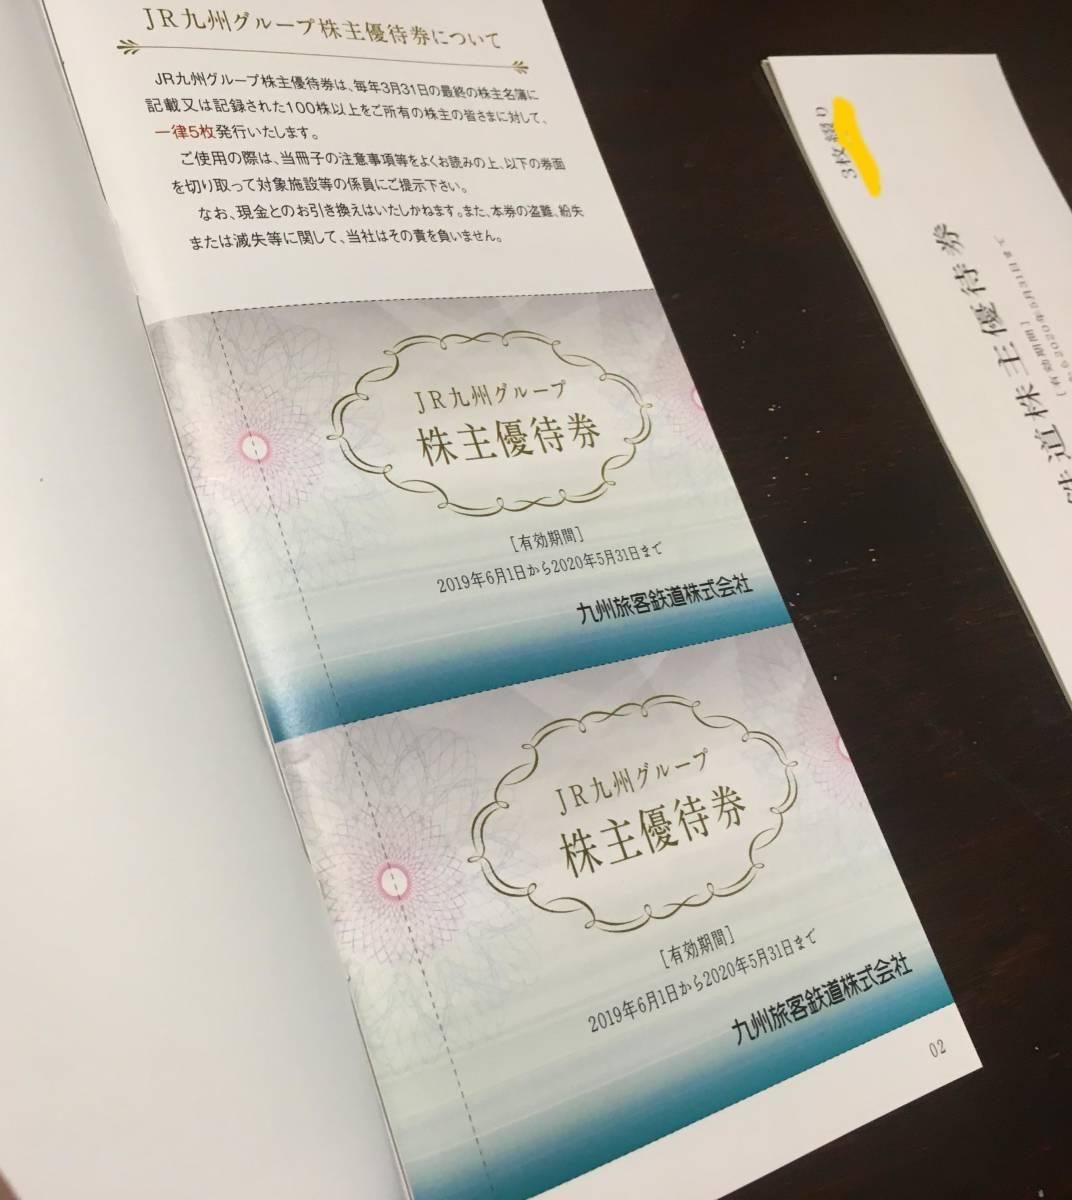 JR九州 鉄道株主優待券3枚+JR九州グループ株主優待券1冊_画像3